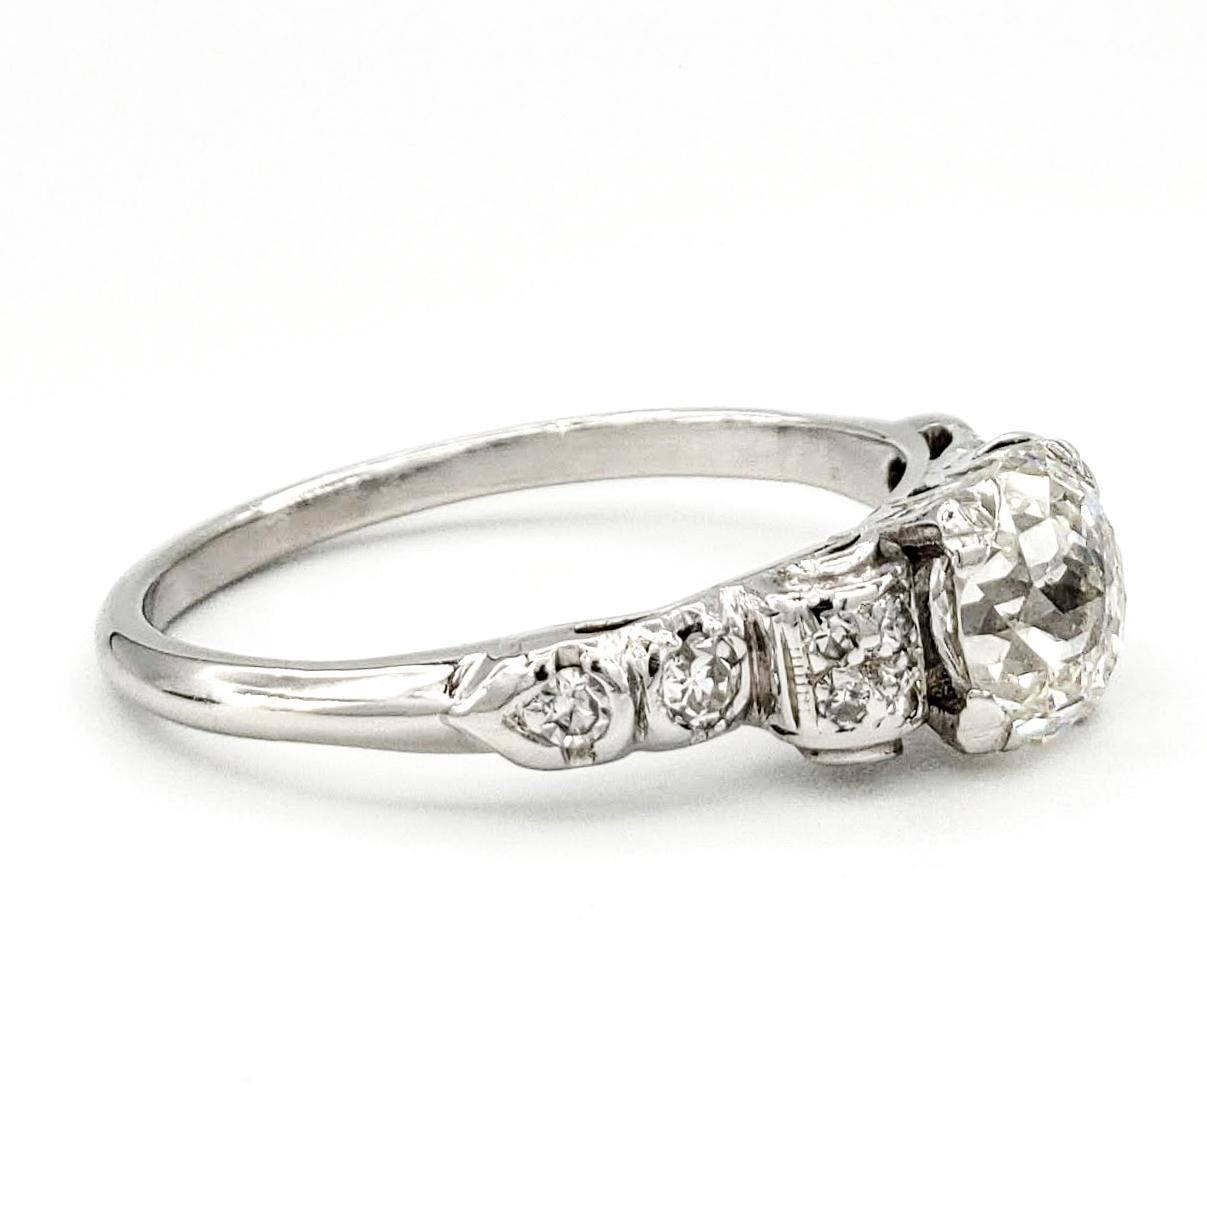 vintage-platinum-engagement-ring-with-1-03-carat-jubilee-cut-diamond-gia-j-si1